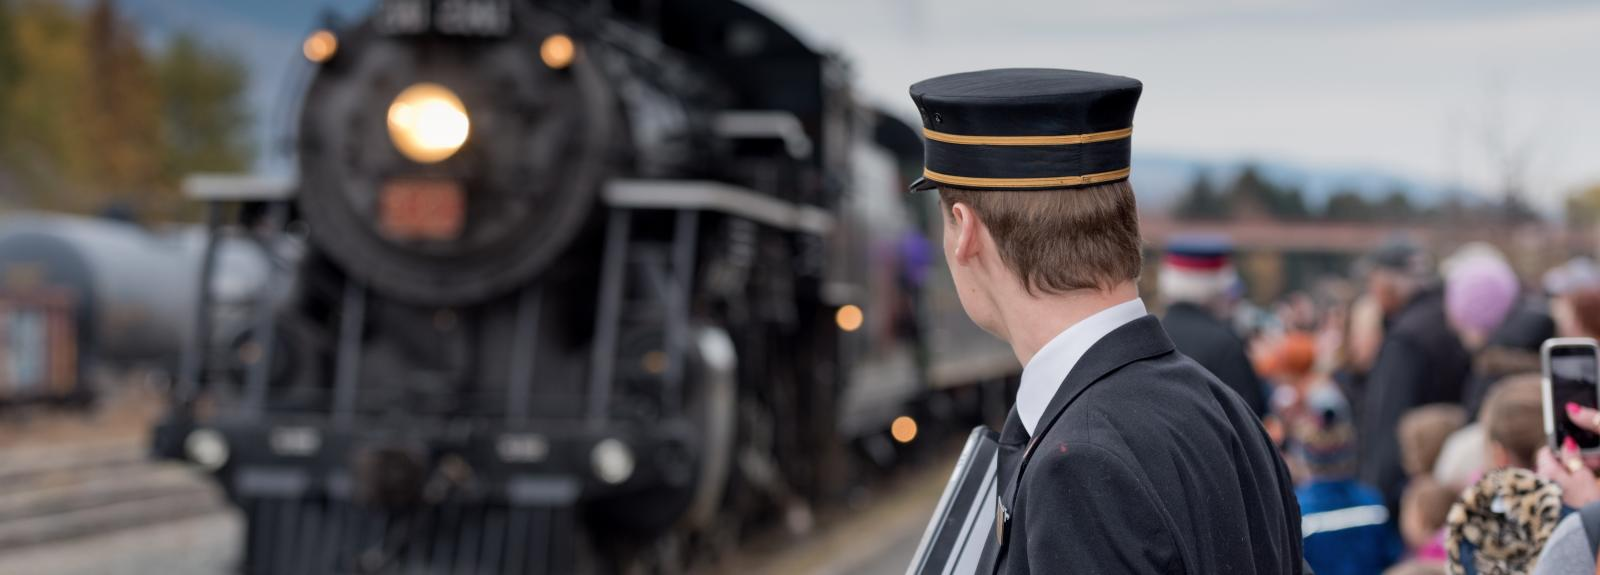 2141 Train